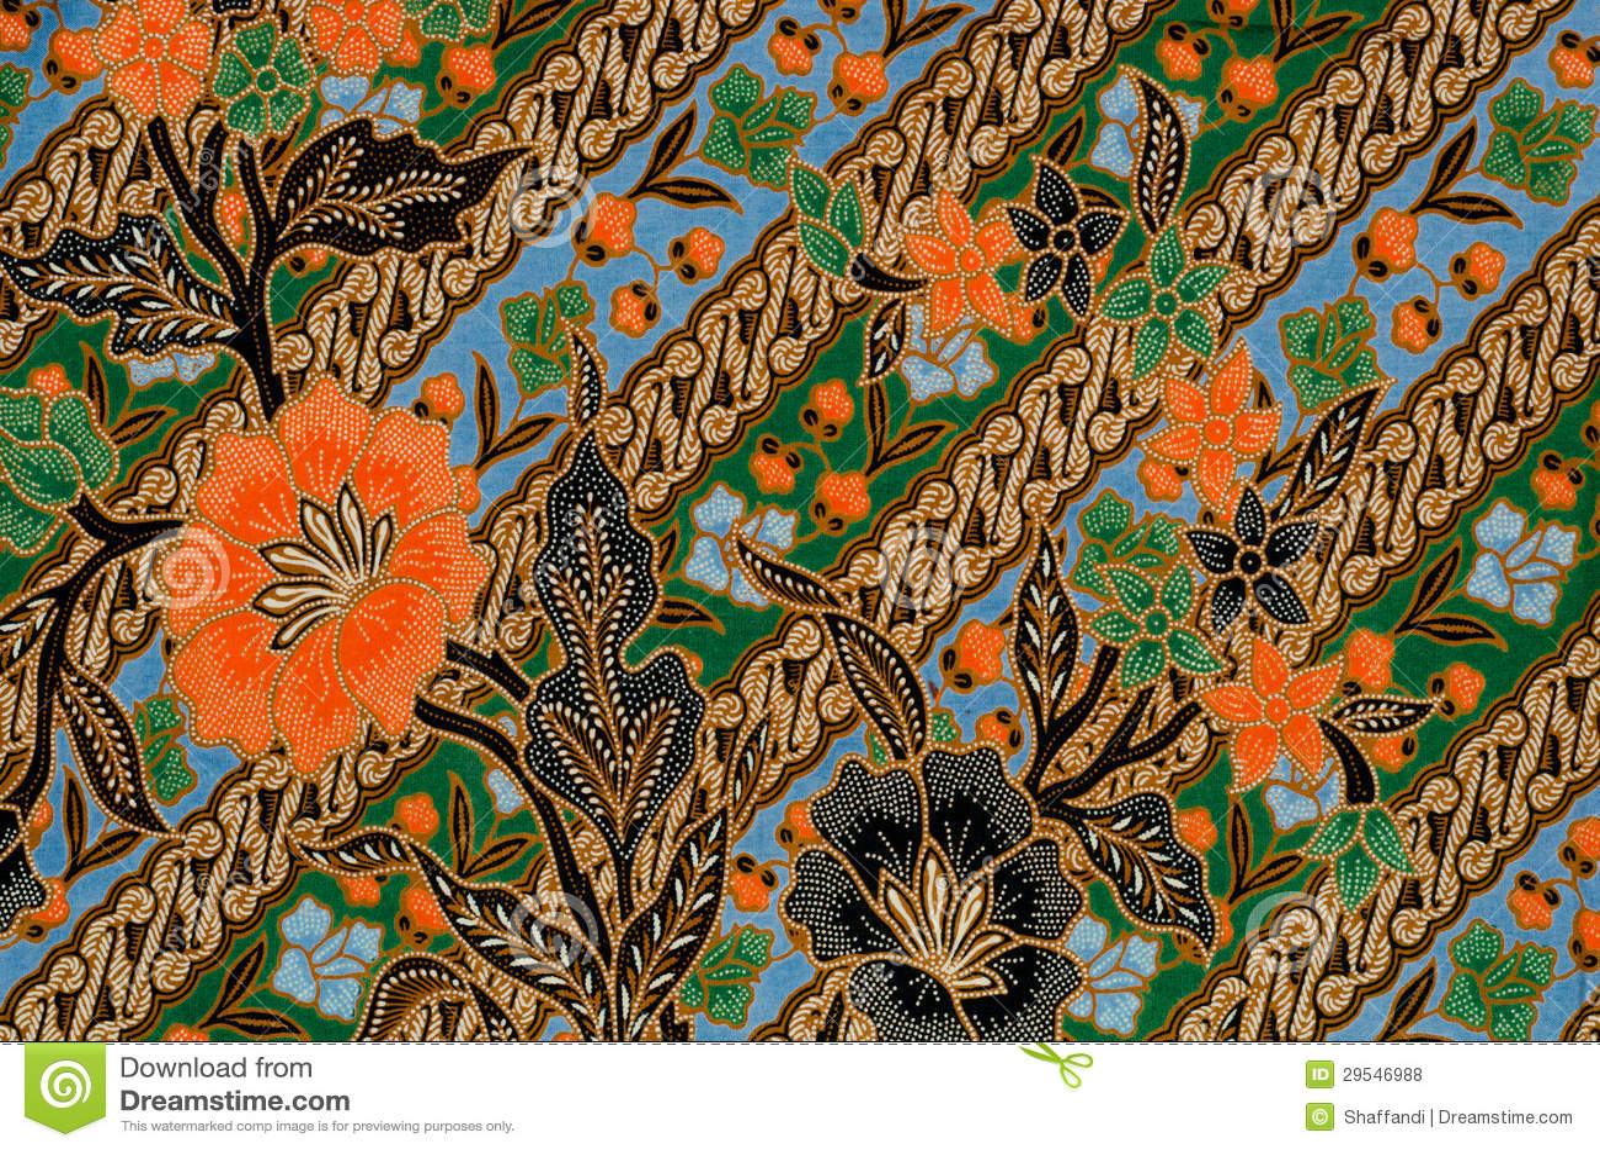 Batik design royalty free stock photos image 29546988 - Royalty Free Stock Photo Batik Design